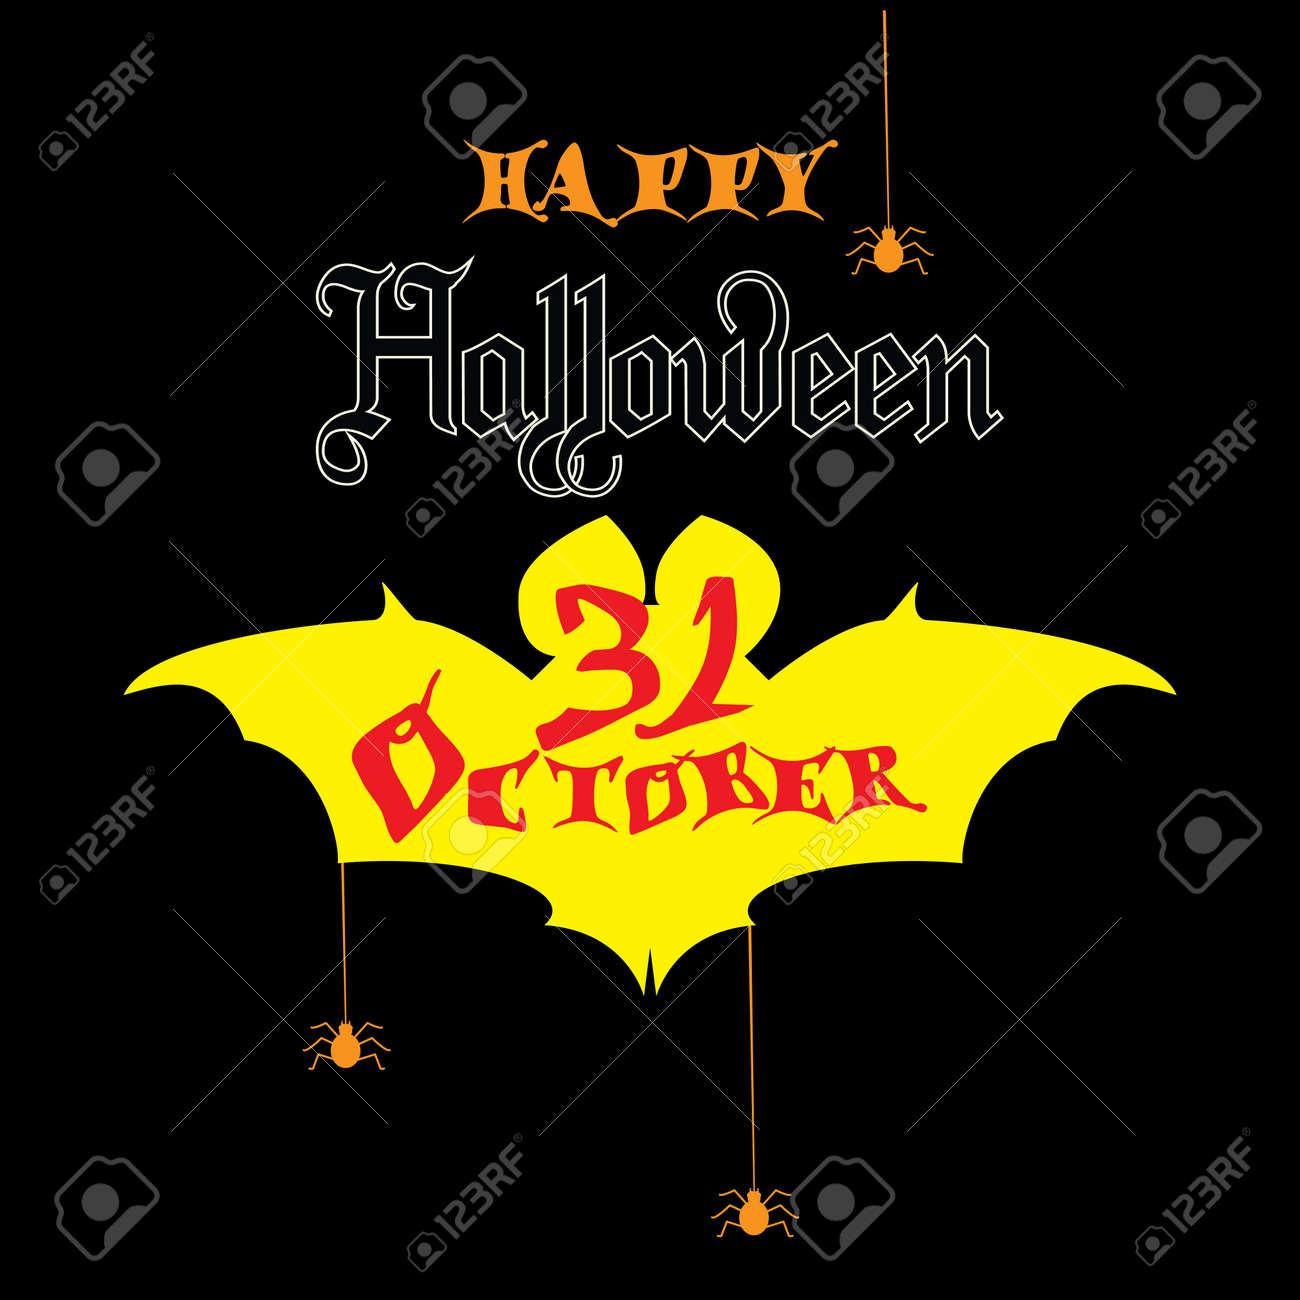 Happy halloween poster with bat logo 31 october icon concept happy halloween poster with bat logo 31 october icon concept design modern halloween invitation stopboris Image collections